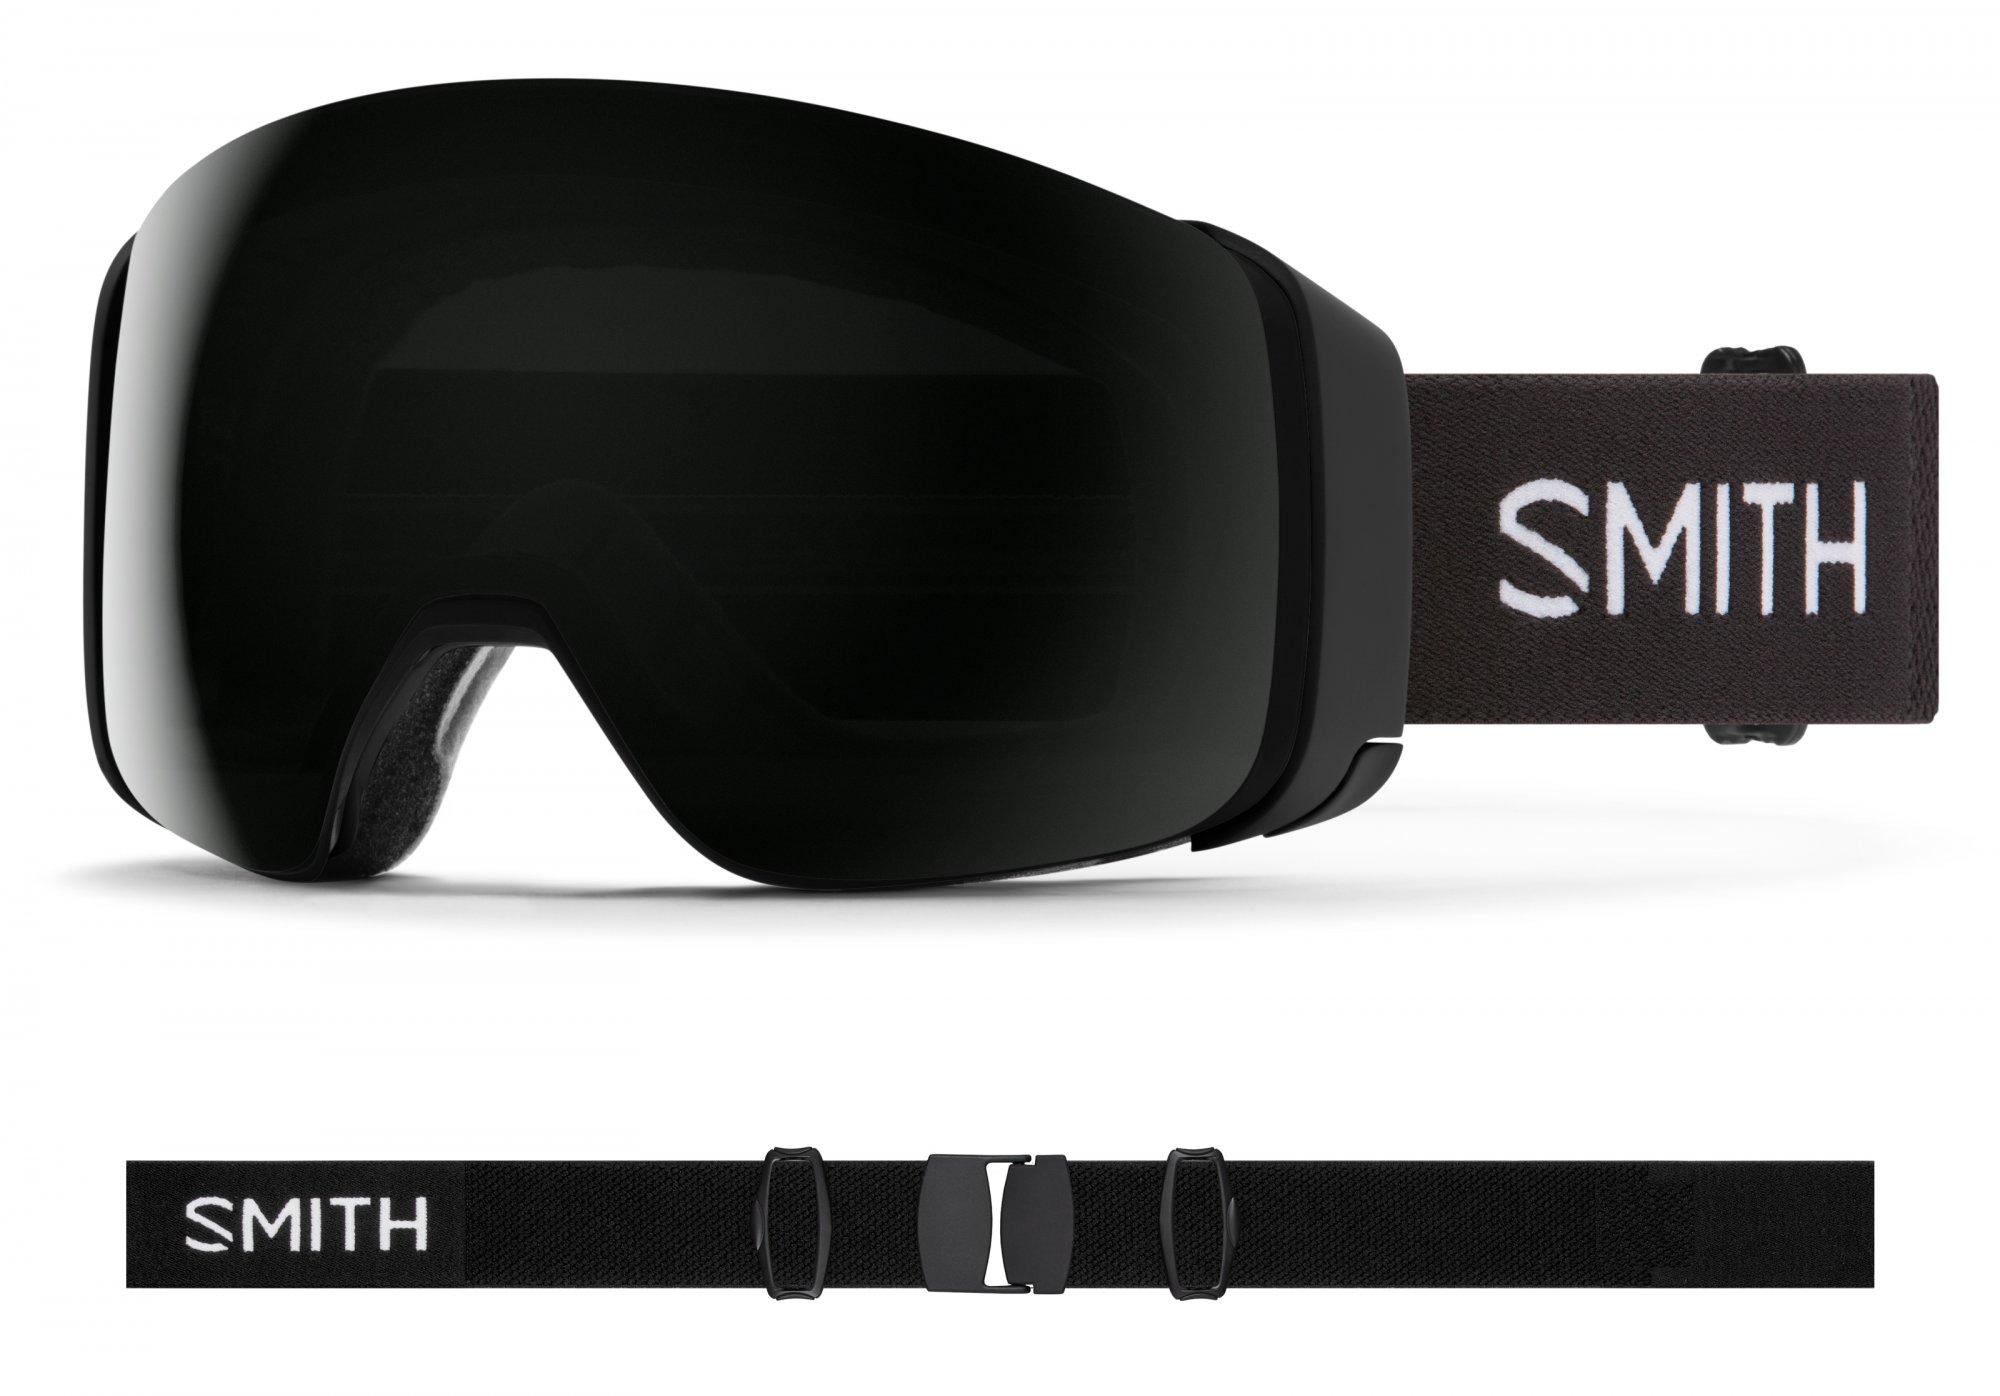 2021 Smith 4D MAG Snow Goggle